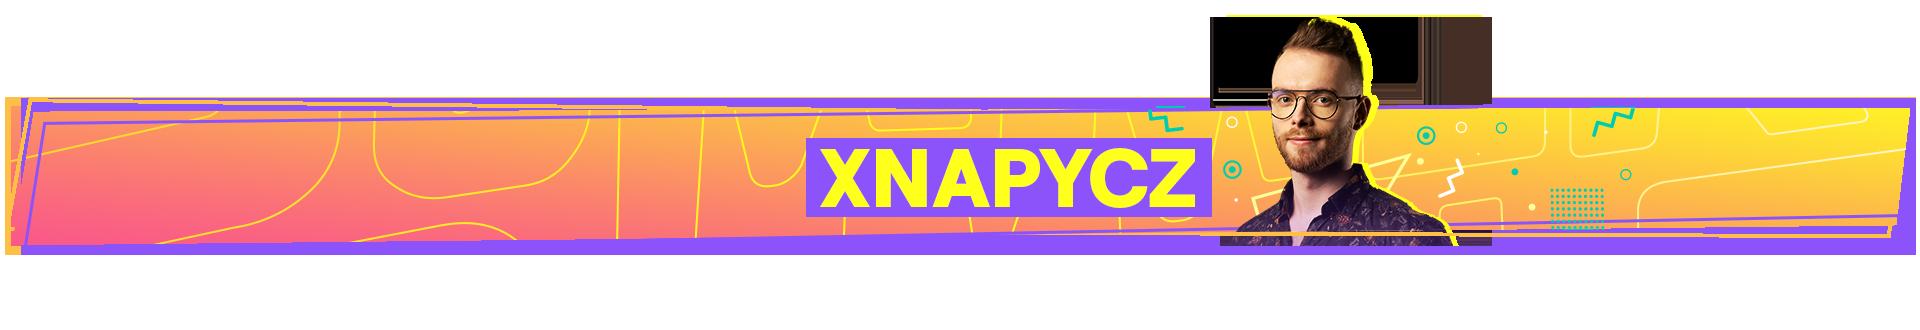 TR_SR_Capt_Support_Image_1080px_Xnapycz.png